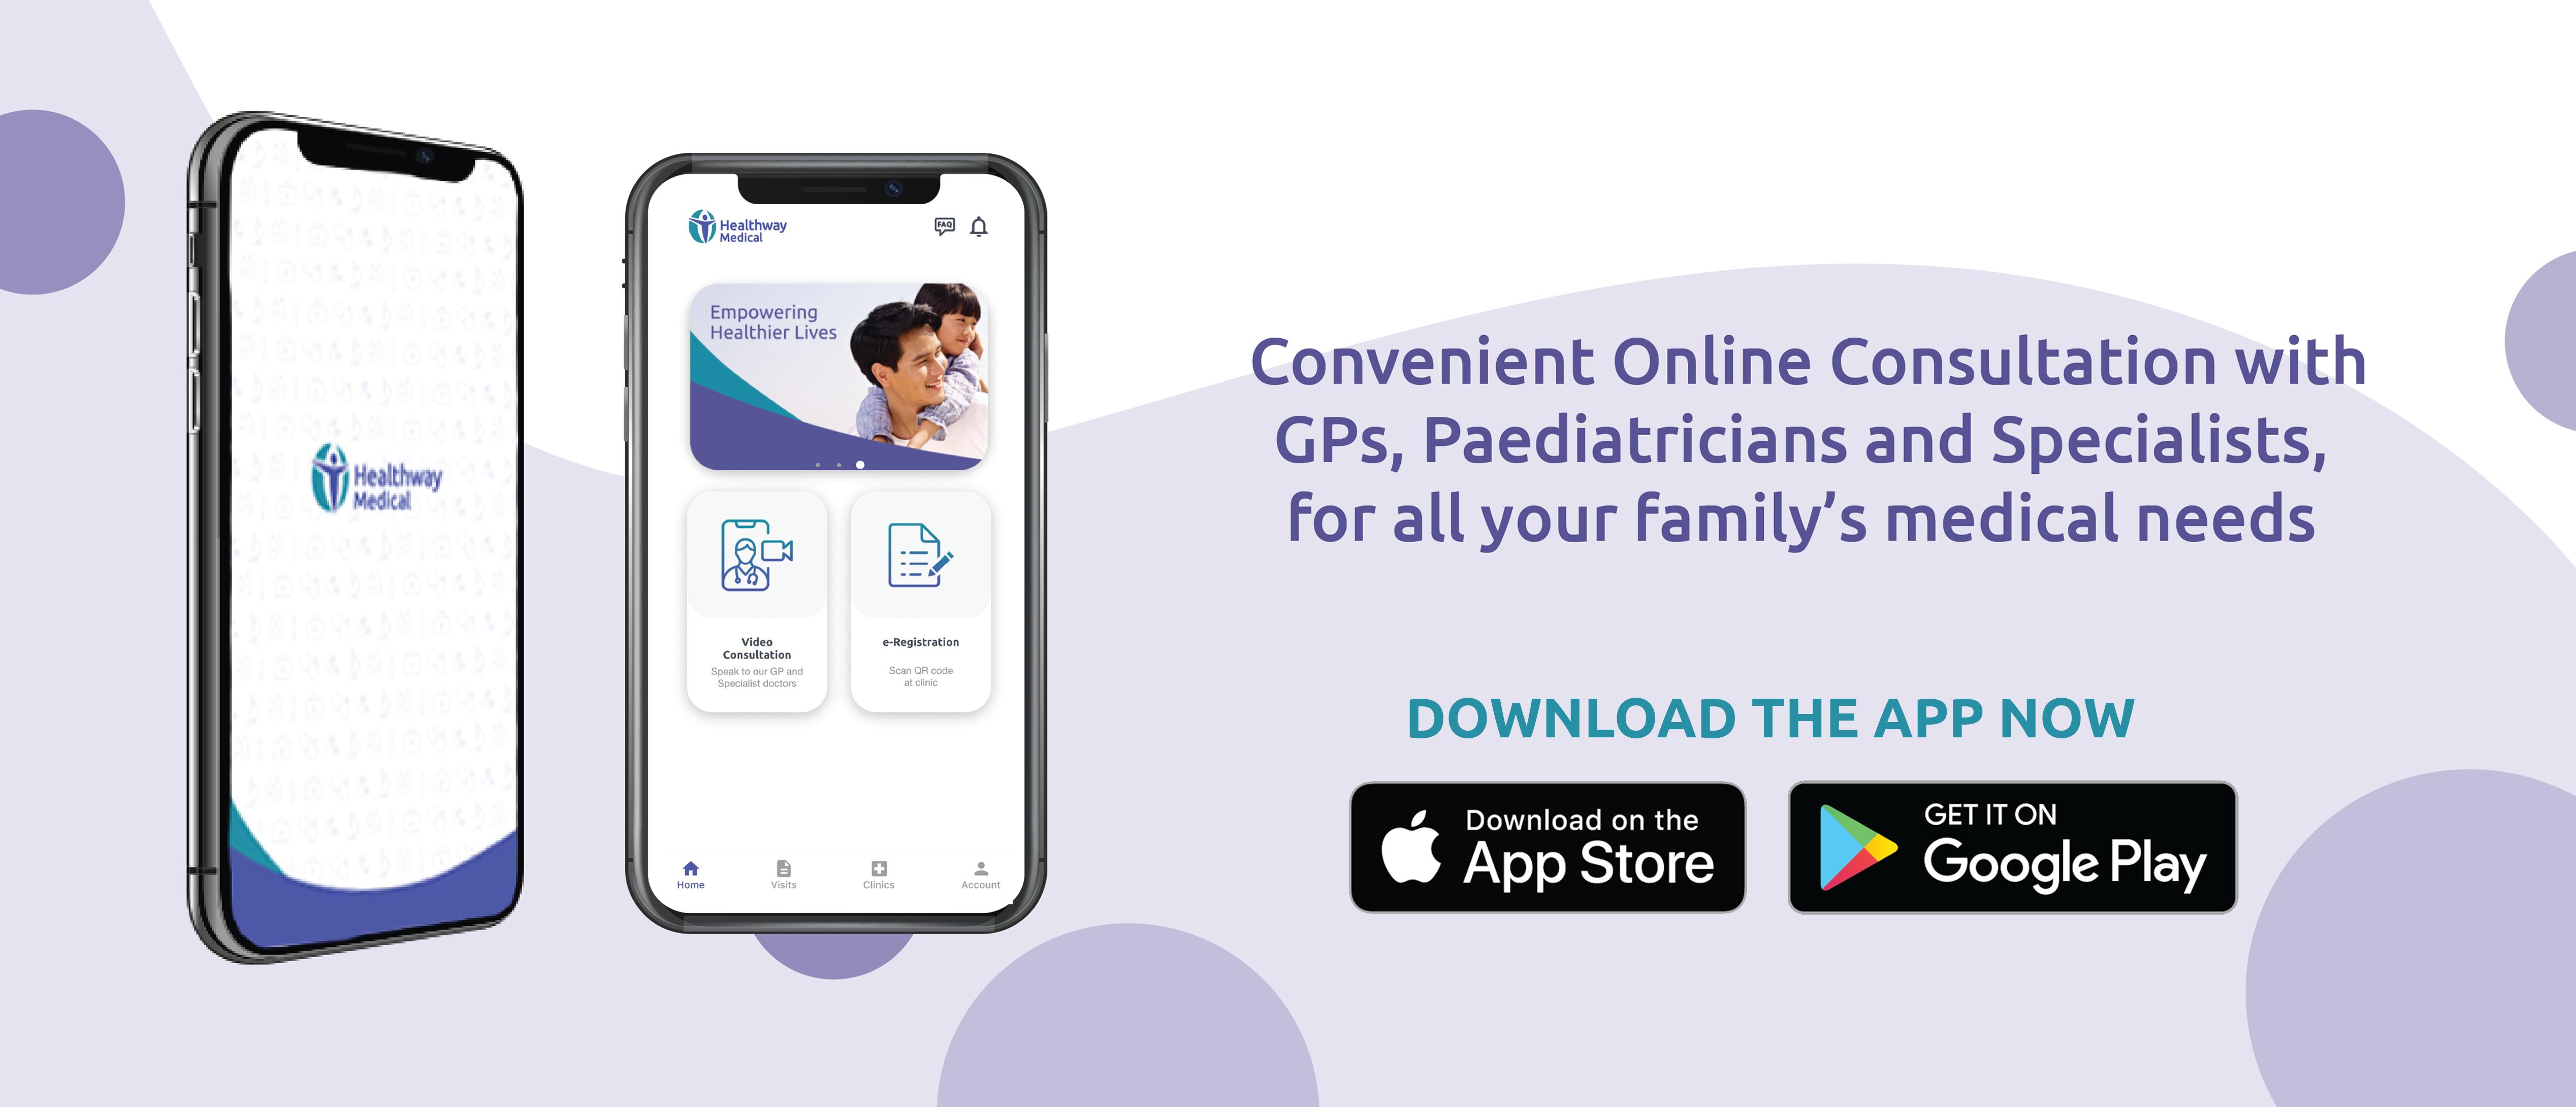 healthway medical app telemedicine download now video consultation